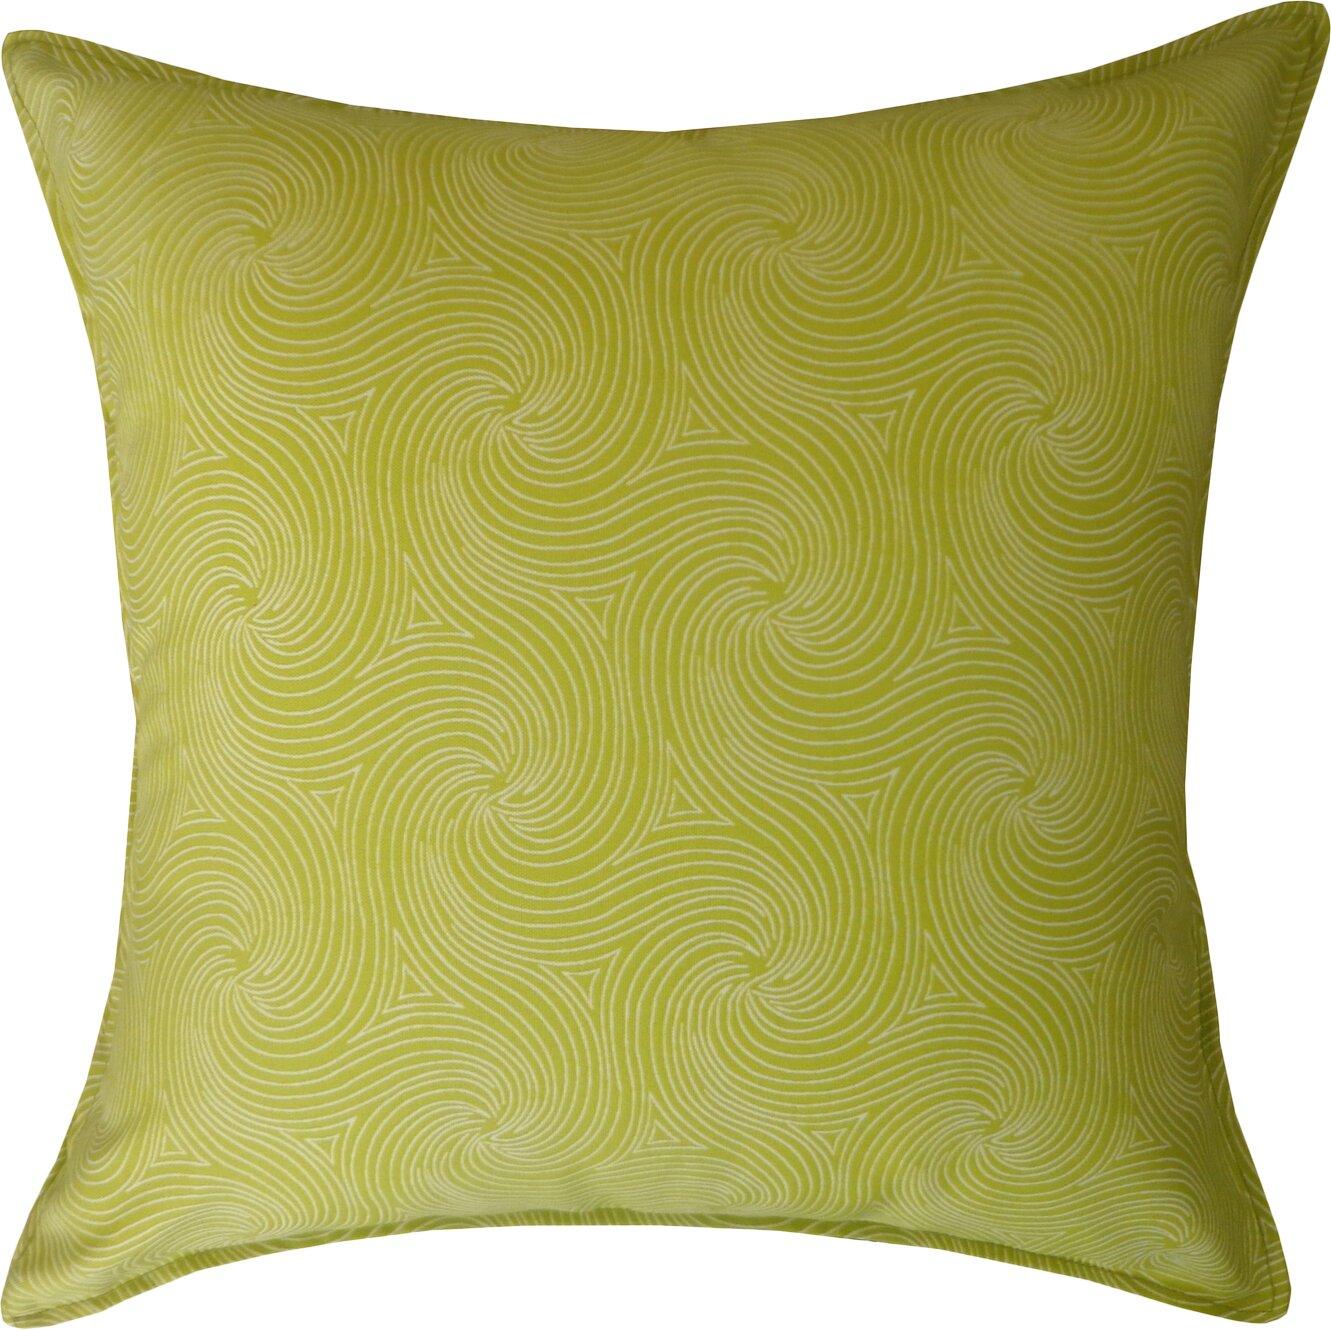 Jiti Swirl Outdoor Throw Pillow & Reviews Wayfair